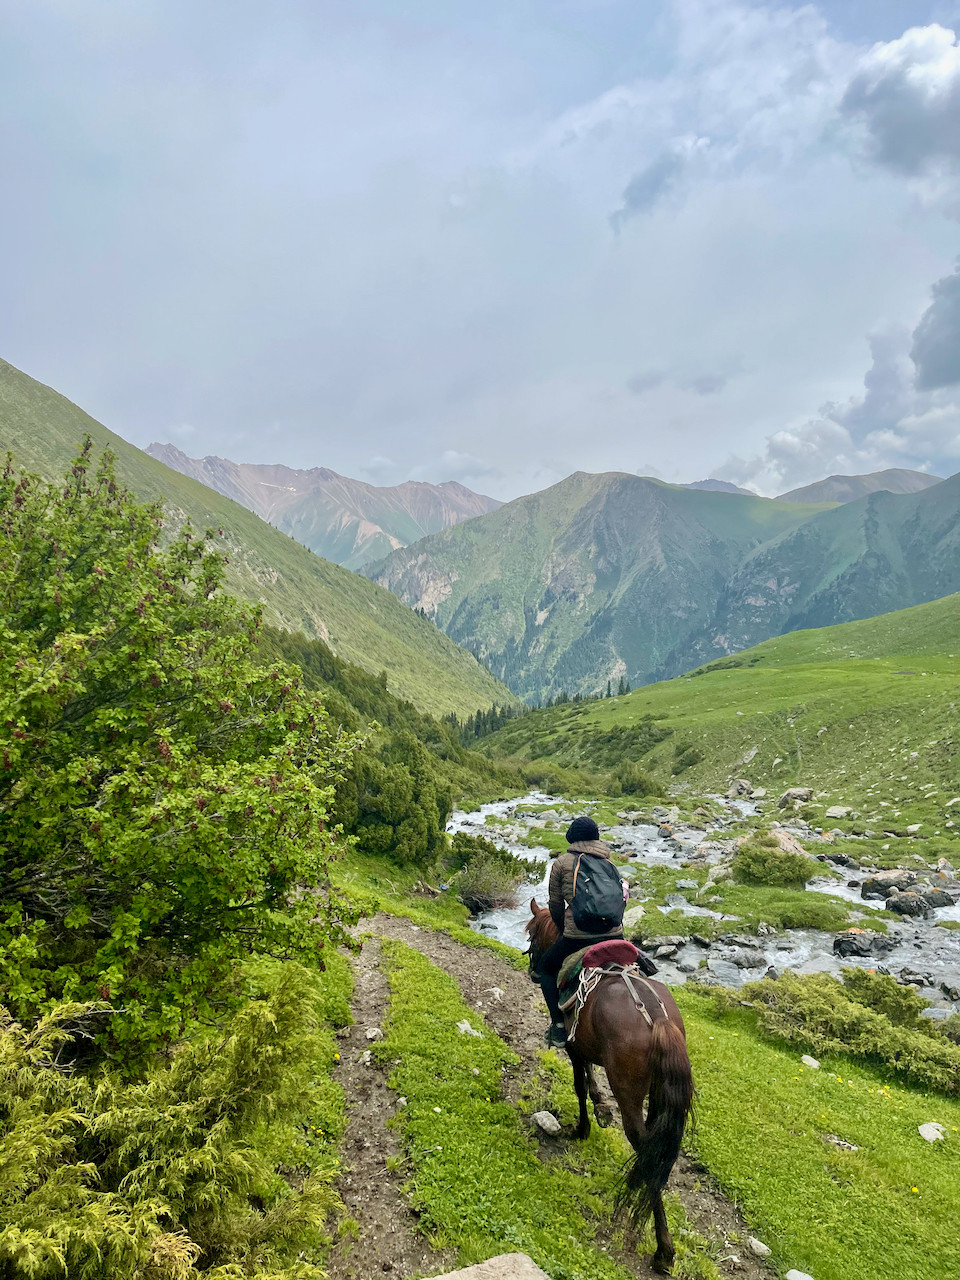 Ala Kul Kyrgyzstan Horse Riding Hike Travel